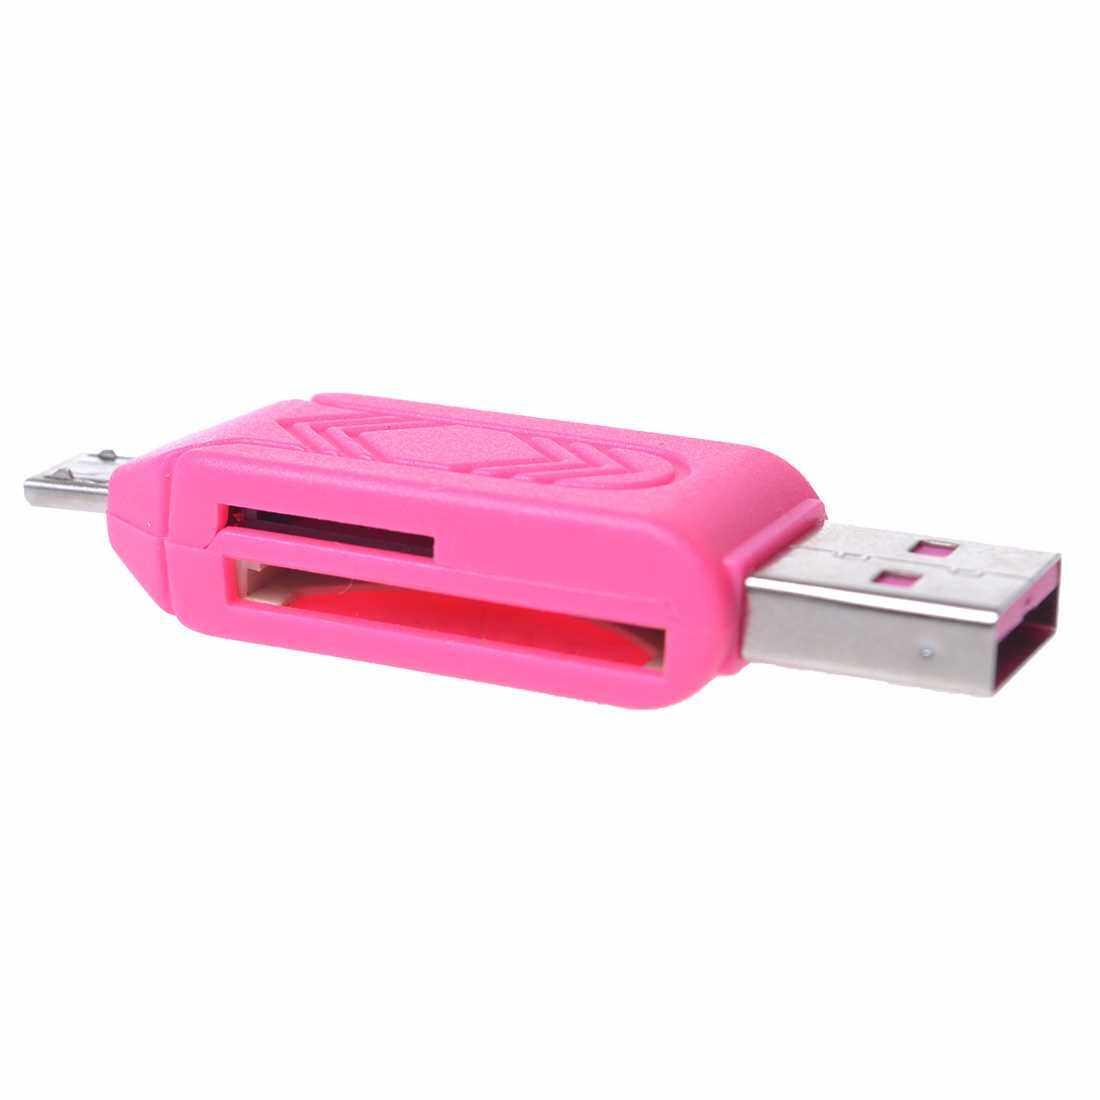 BLUCUB OTG Computer+Phone Card Reader USB+Micro USB Port SD/TF Card Pink (Pink)